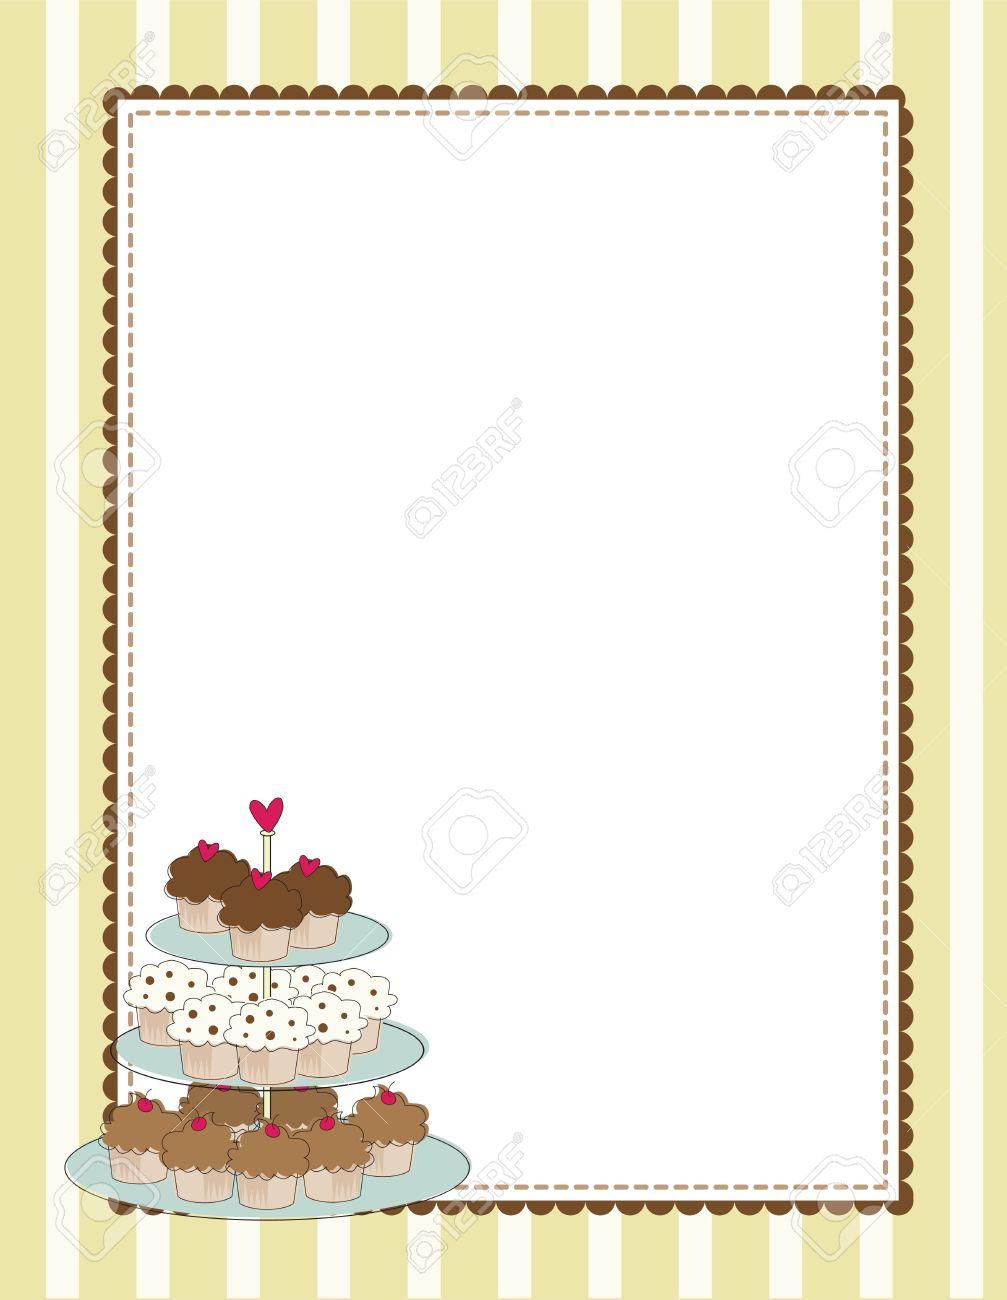 Free Border Clipart dessert, Download Free Clip Art on Owips.com.